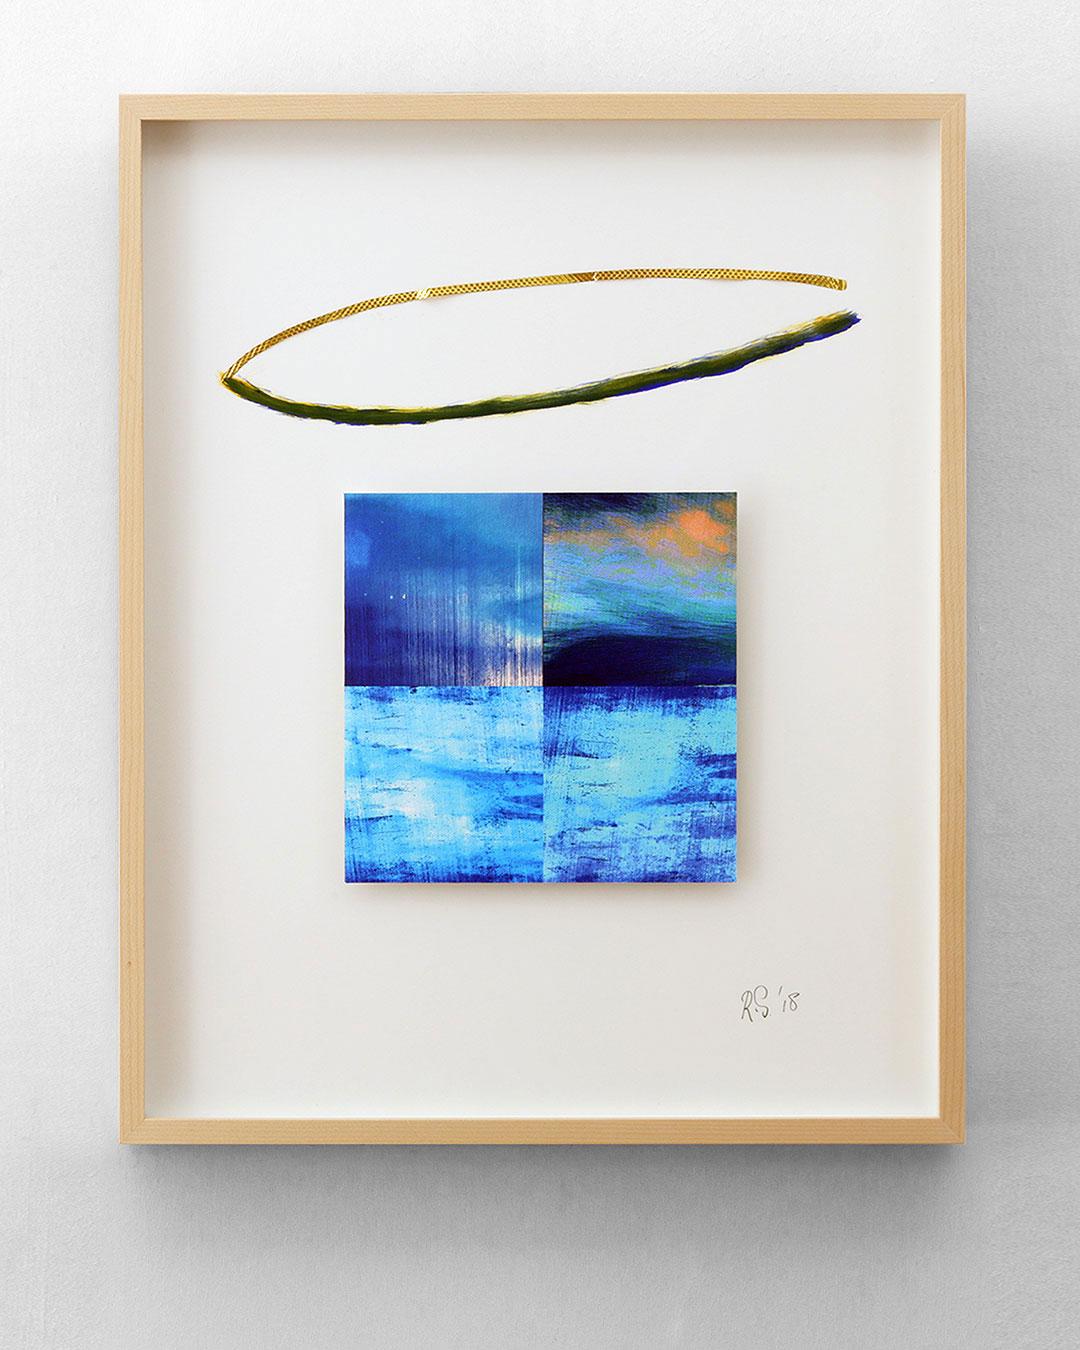 Robert Smit, Framed Sketch for Necklace, 2018, sketch; gold, paint, ink on canvas, 400 x 500 mm, €6000